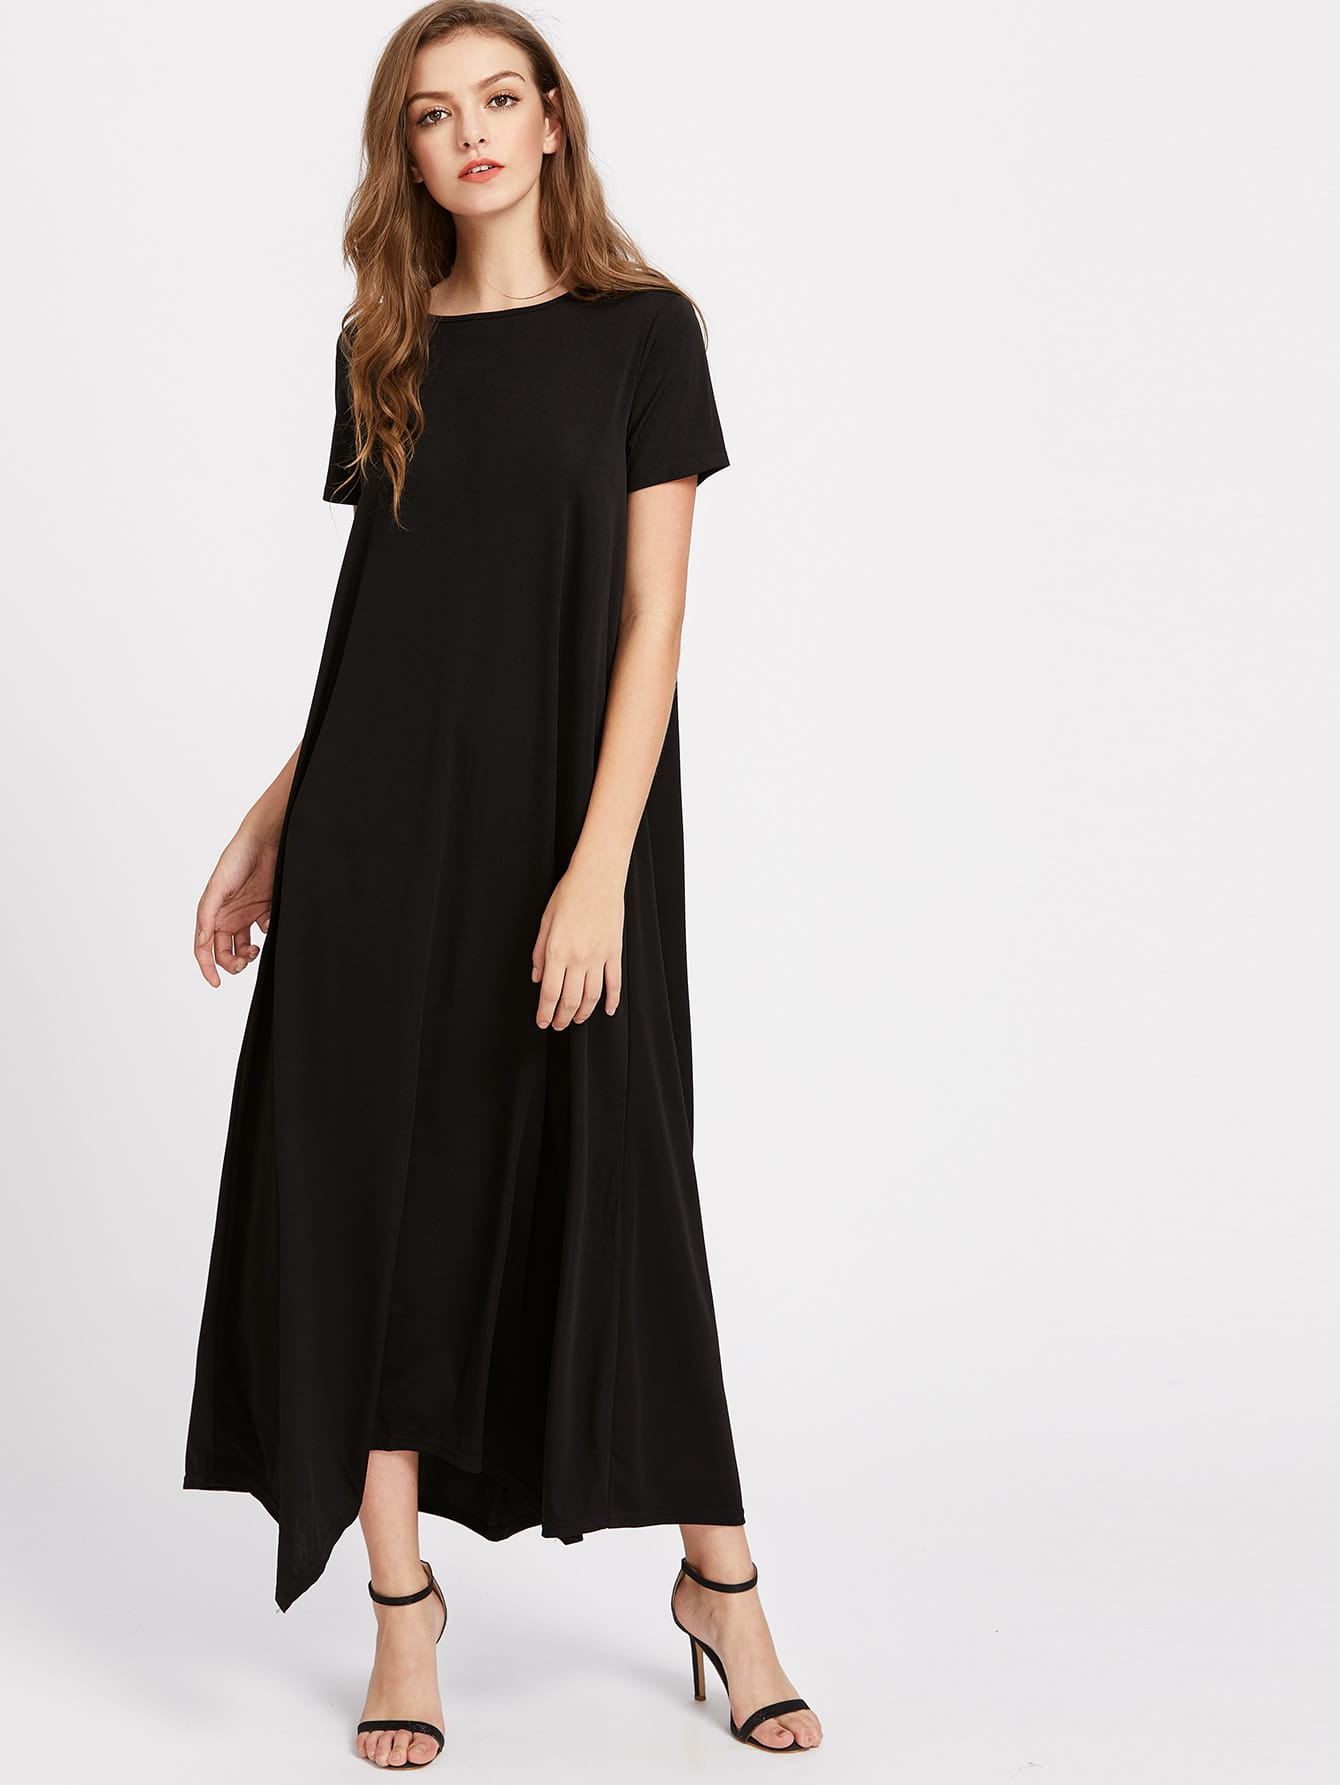 Hanky Hem Tent Dress With Hidden Pocket high slit hanky hem metallic halter dress